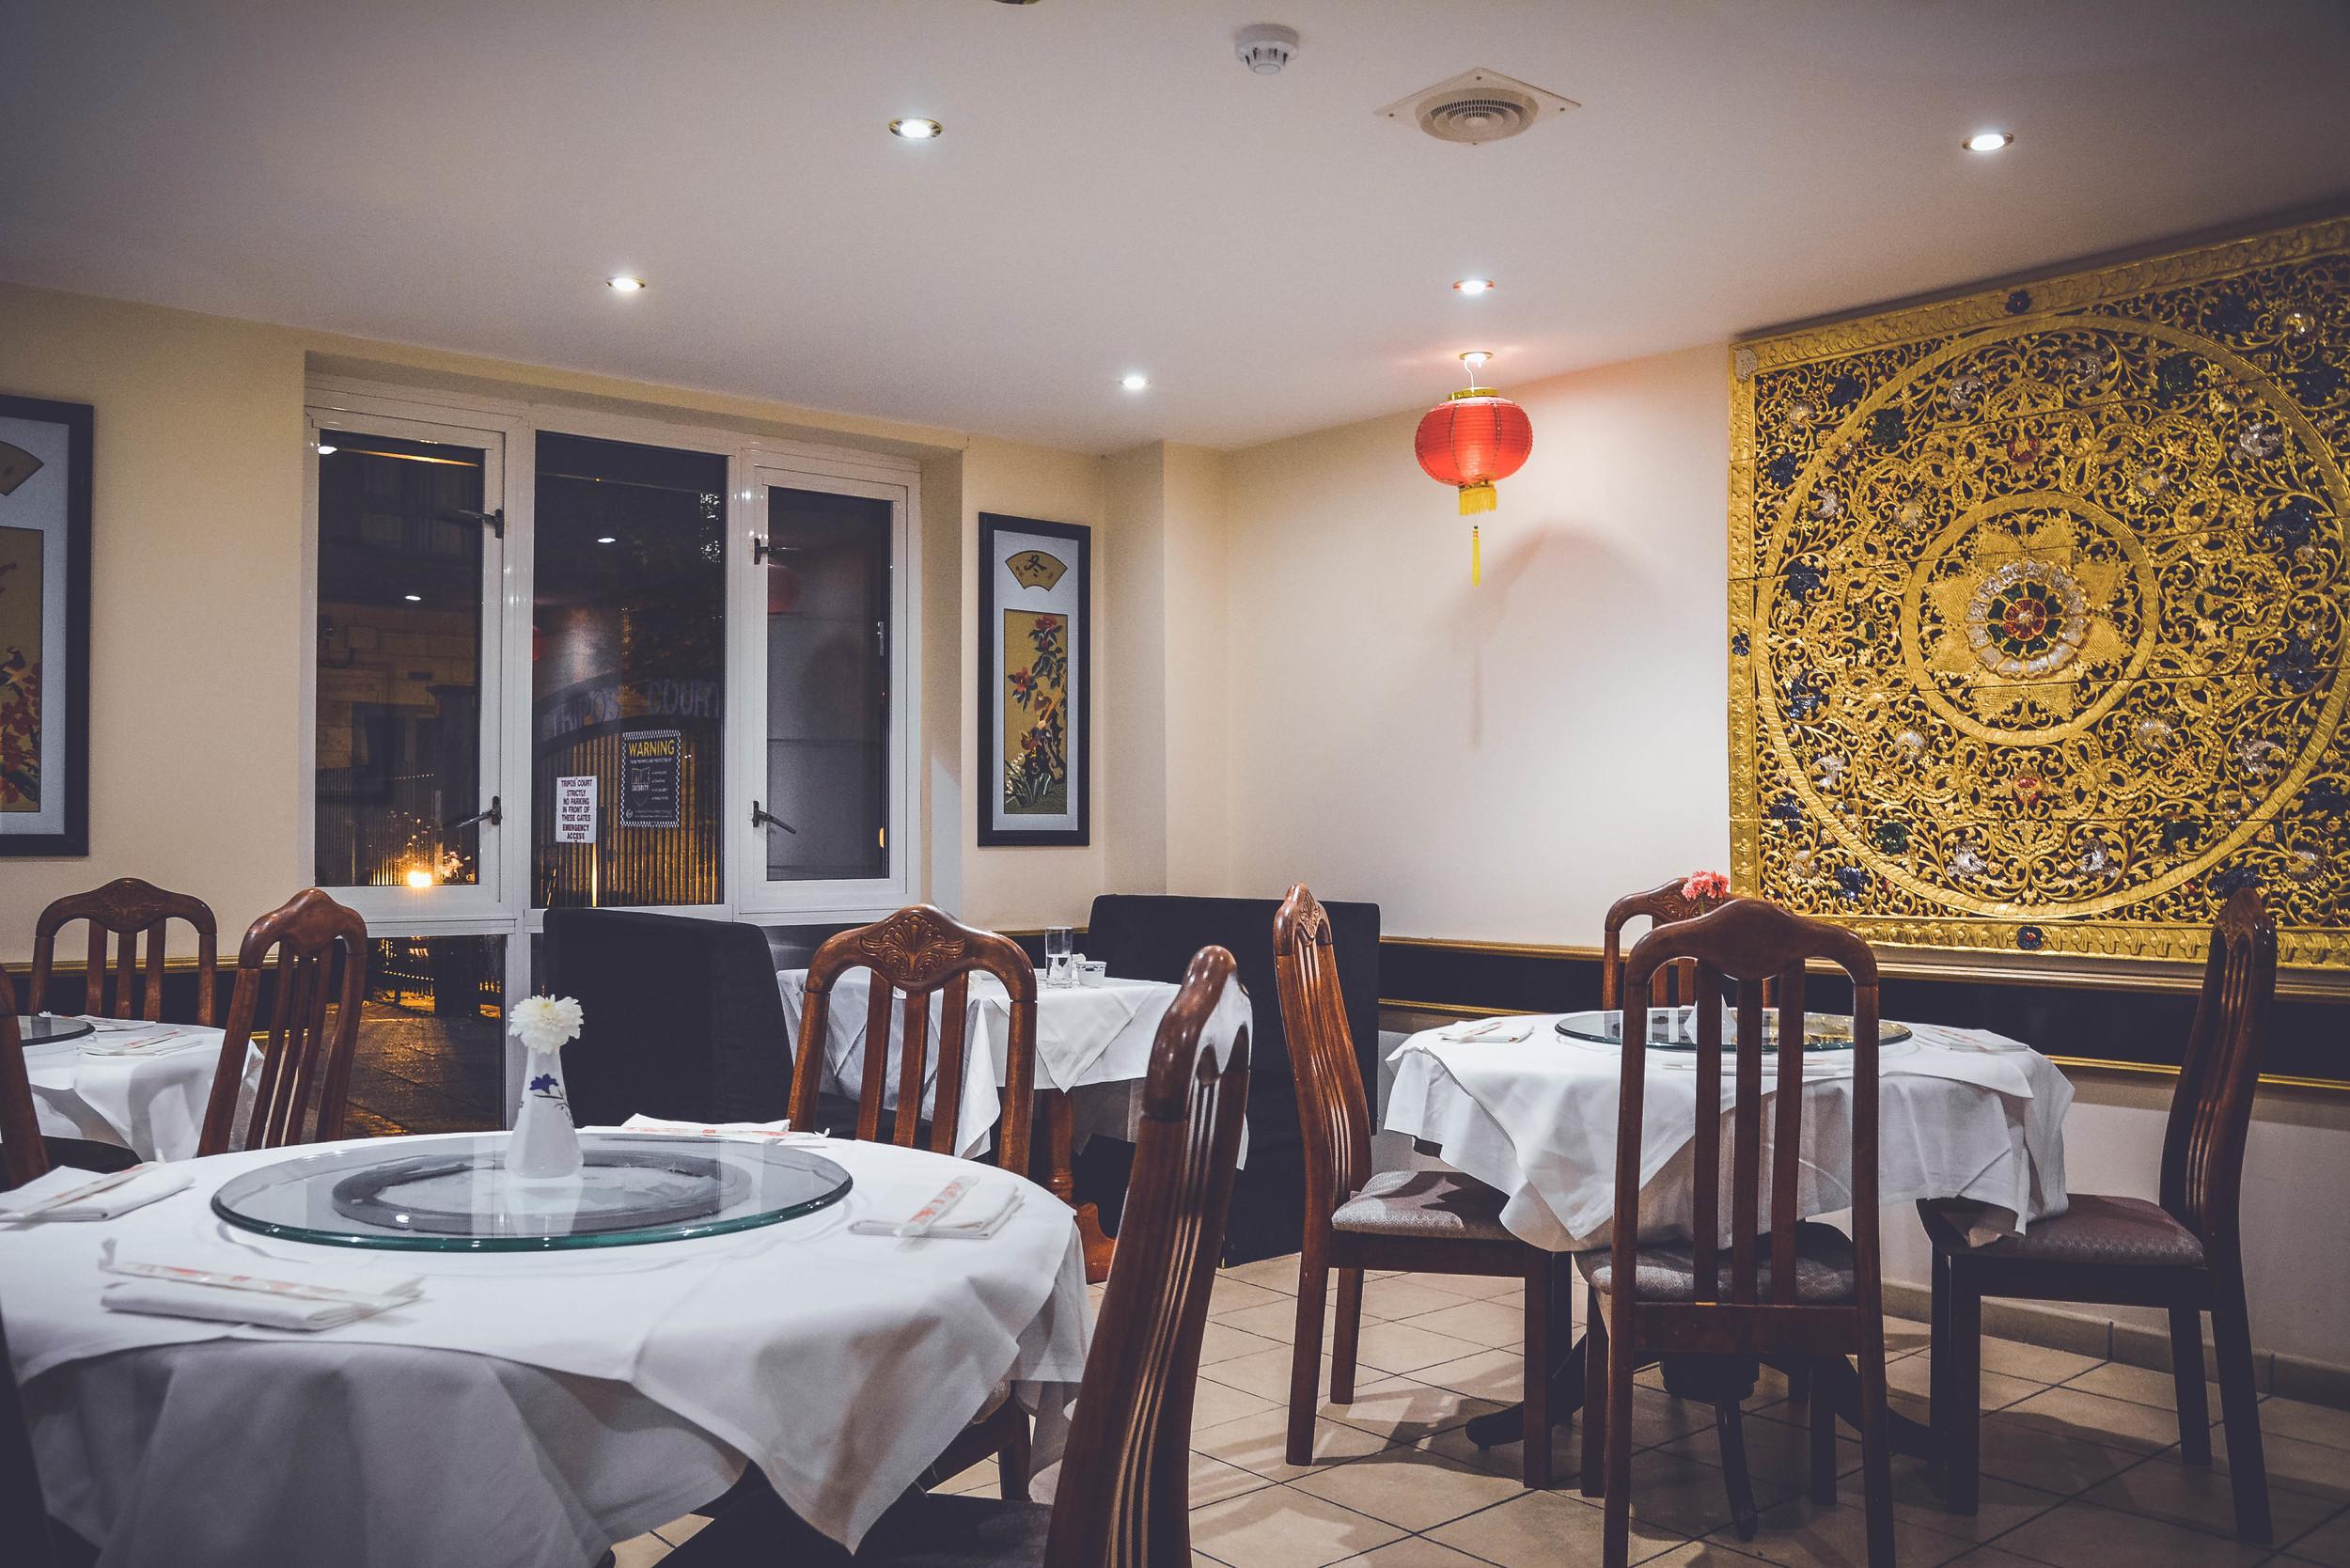 Peking_Restaurant_Cambridge_Inside1.jpg